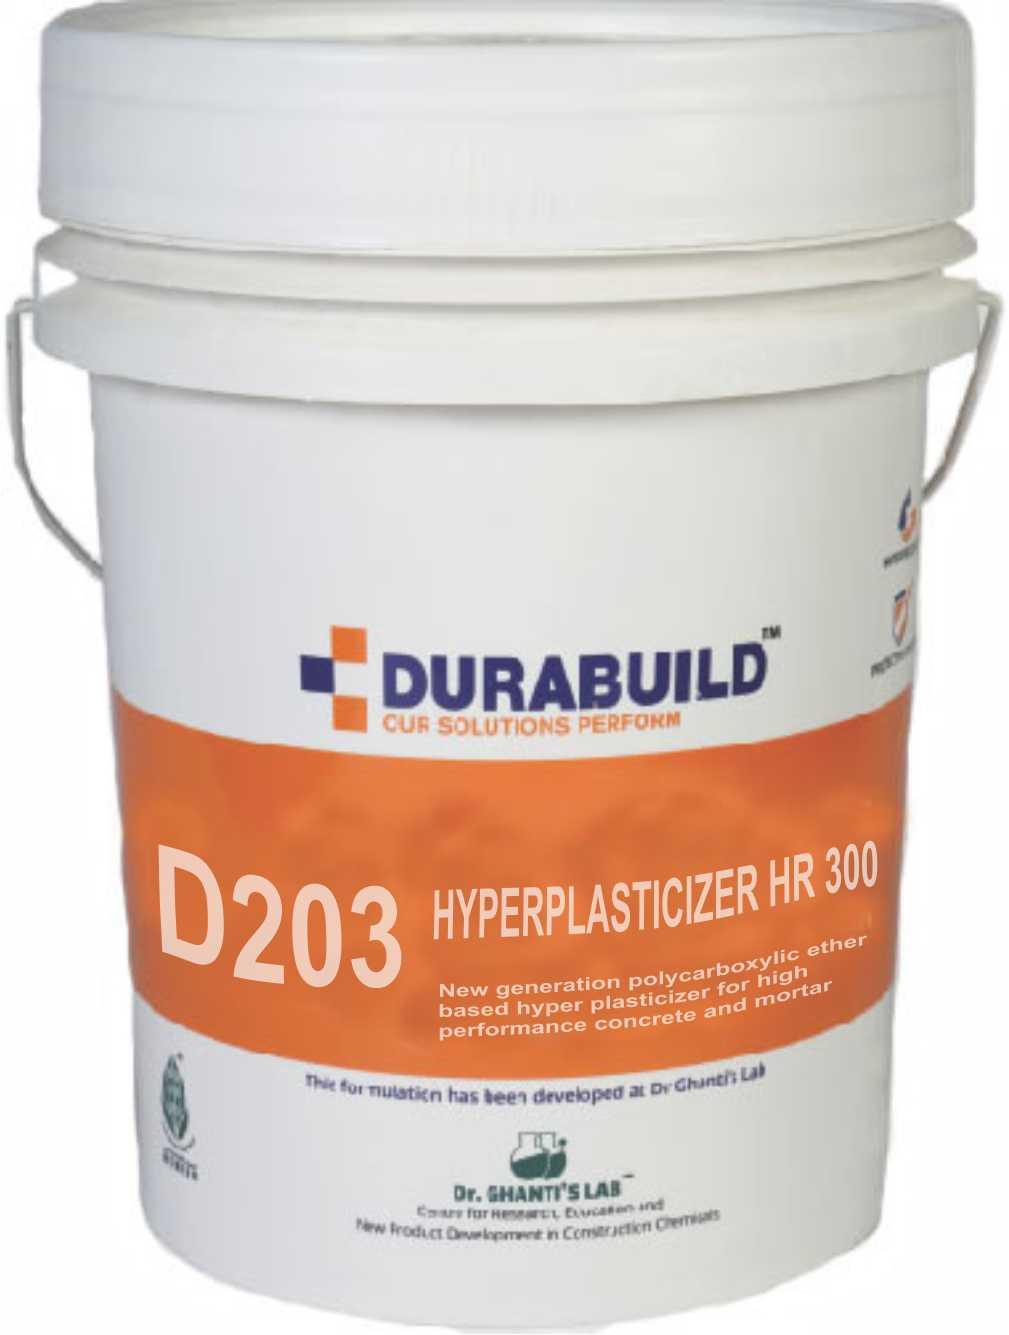 Hyper PlastIcizerLR(200)